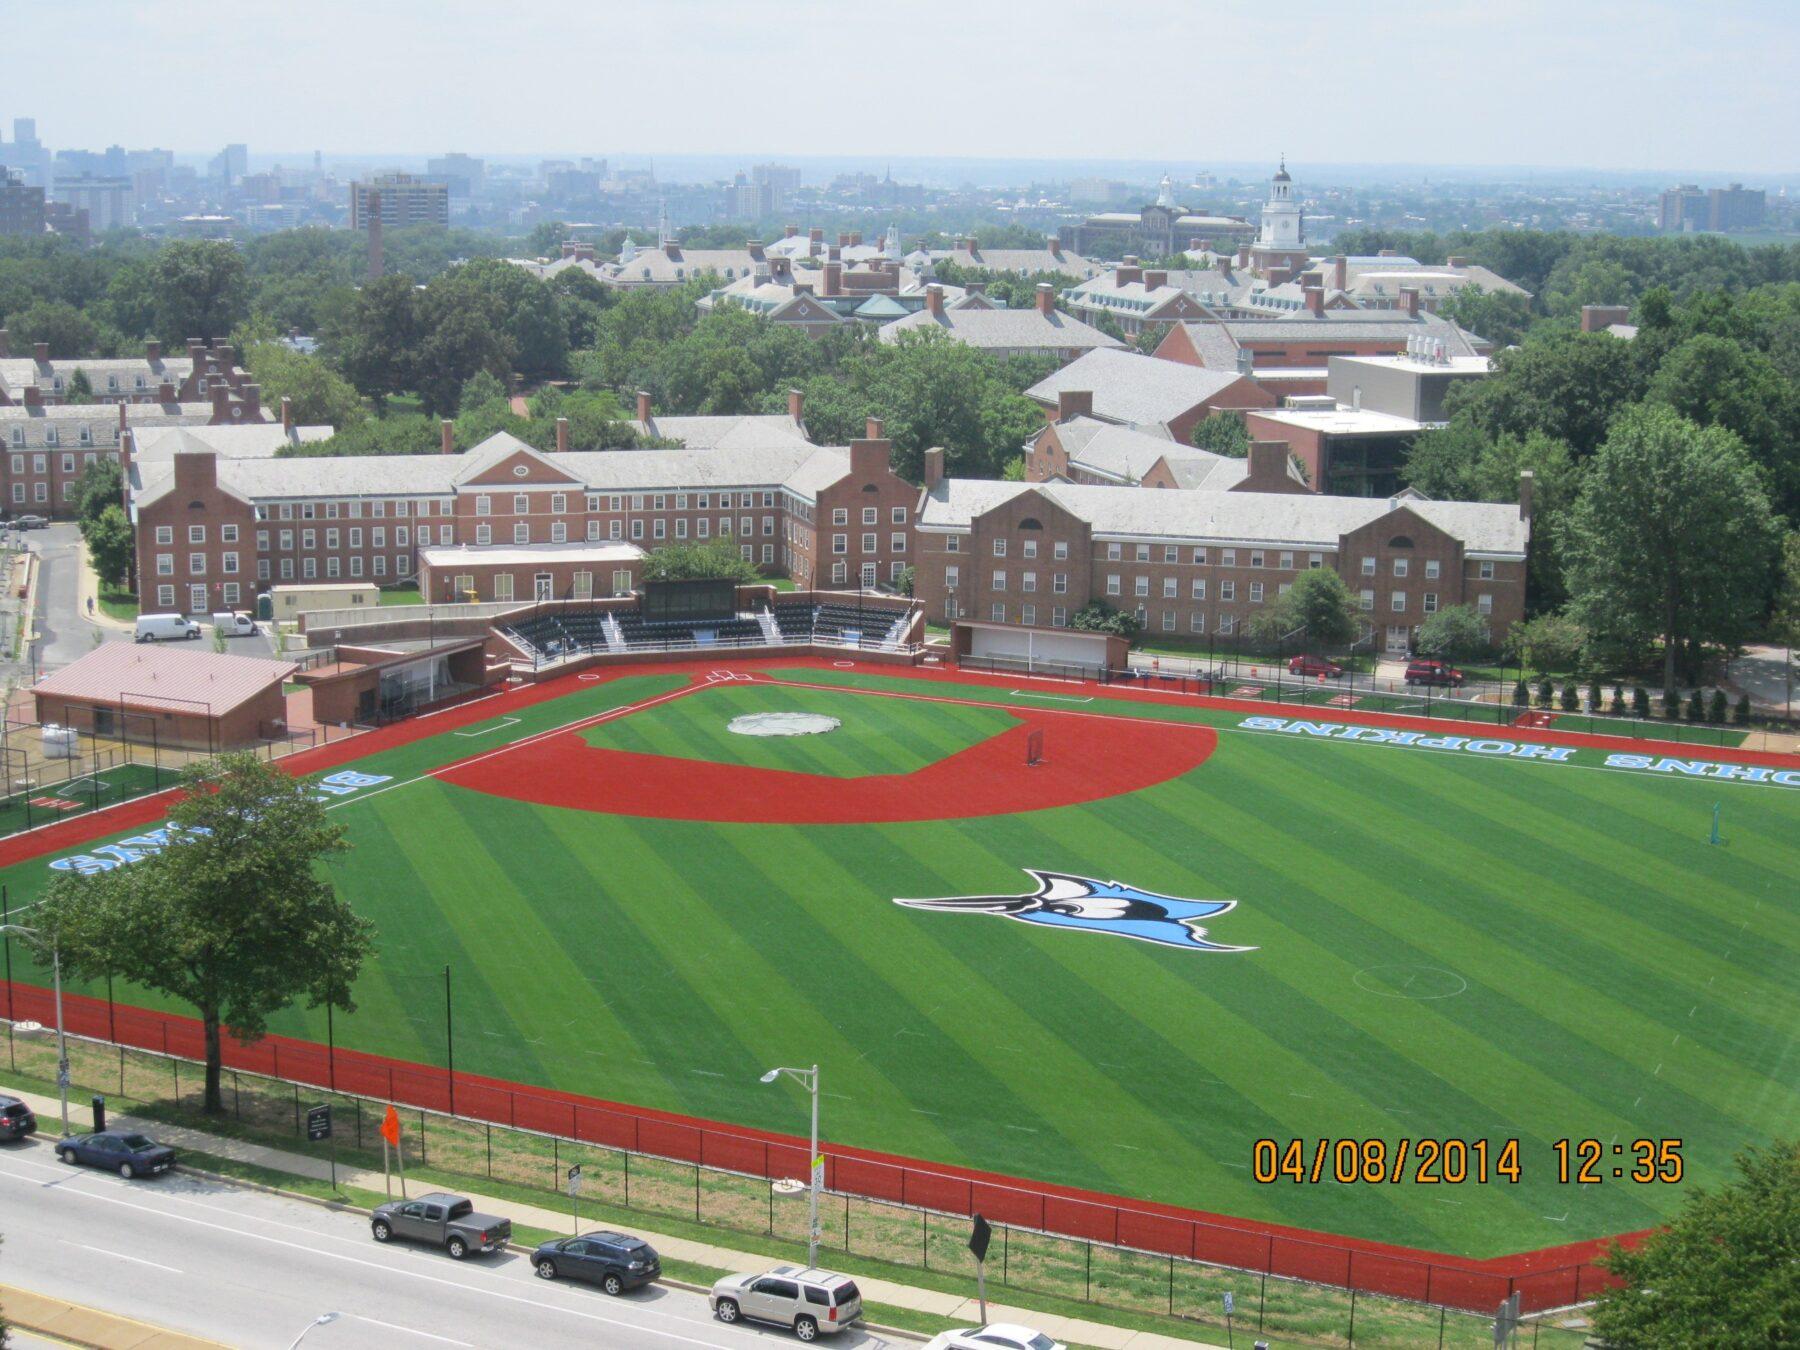 Johns Hopkins University Baseball Field and Facilities